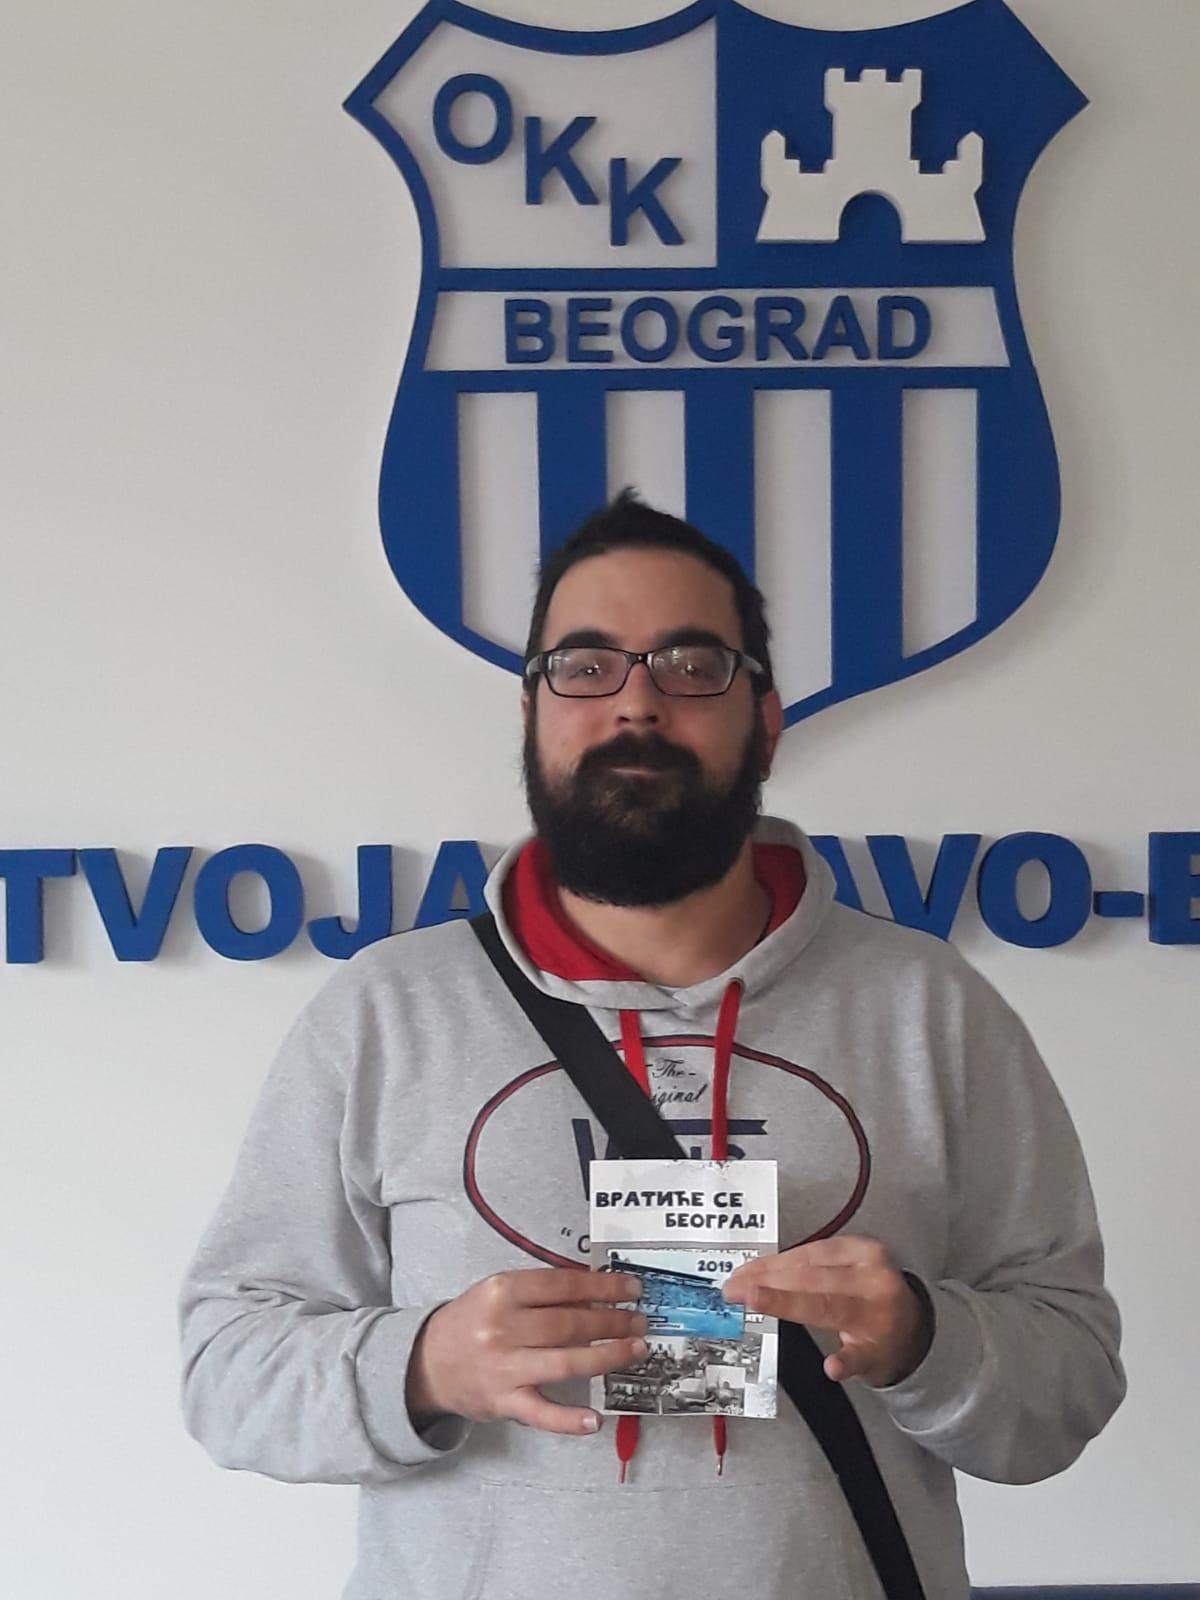 Marko Đurković Oskar – fizio OKK. Deset godina u klubu!